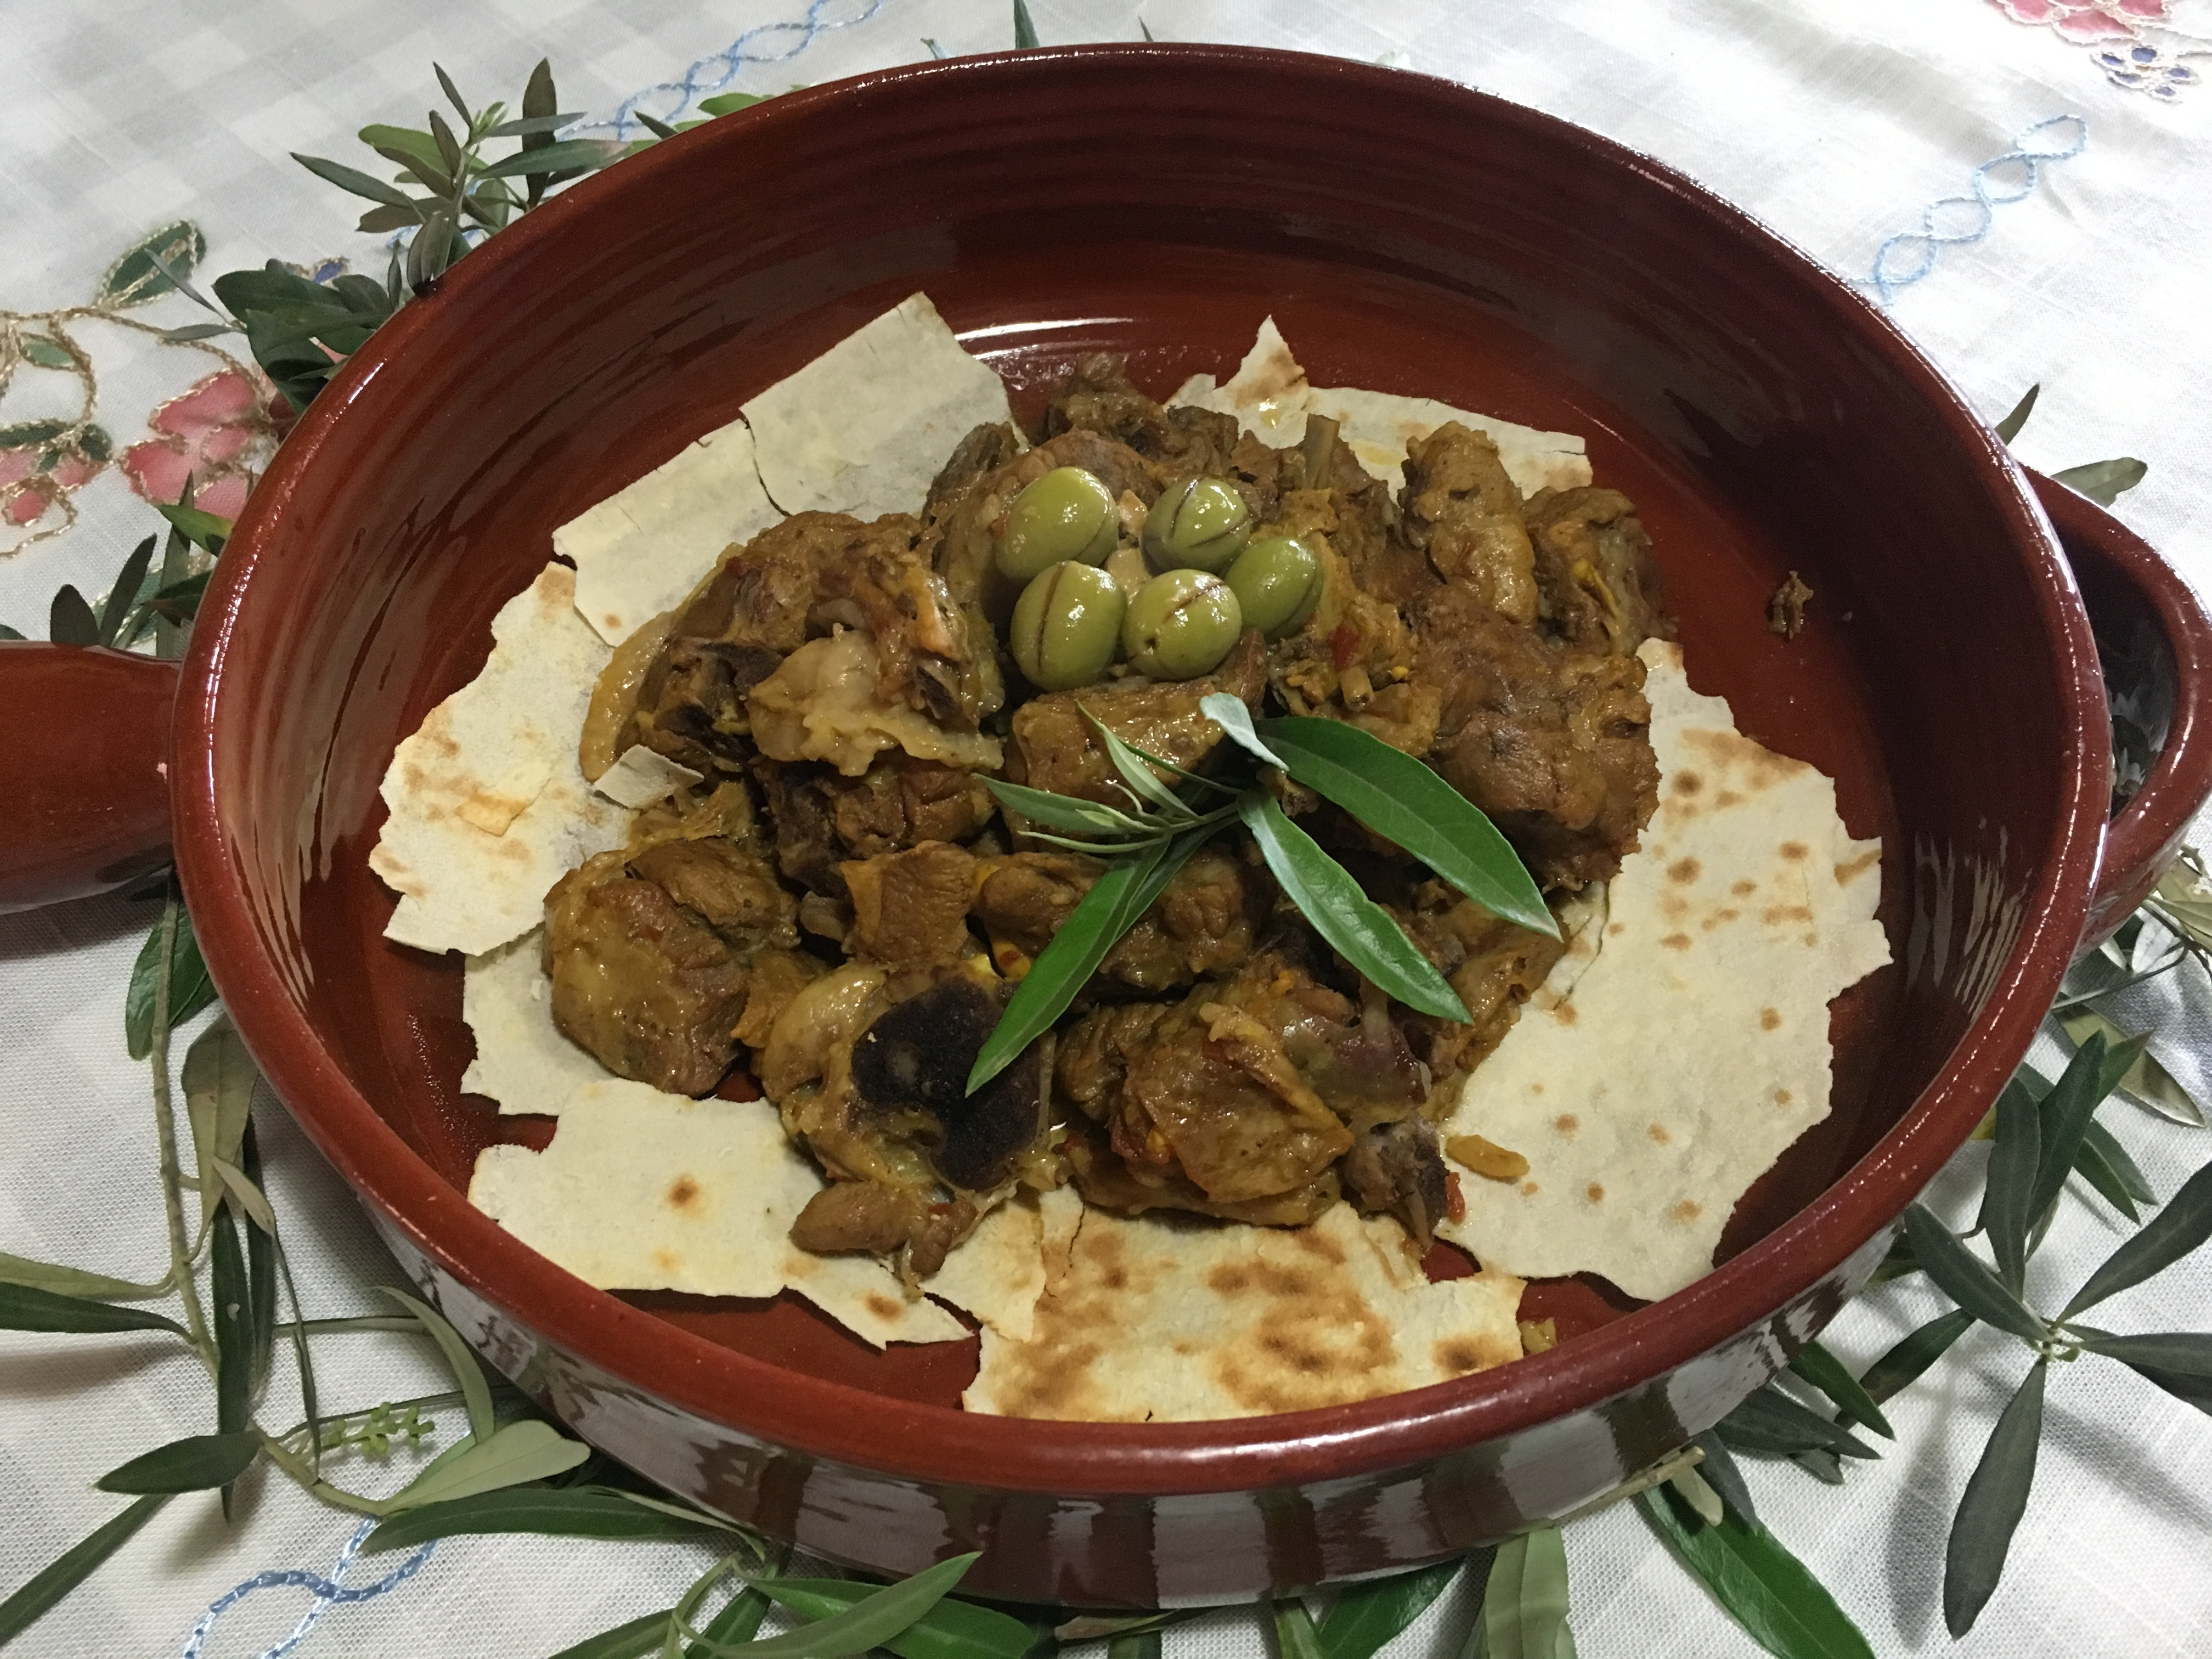 cucina tradizionale sarda